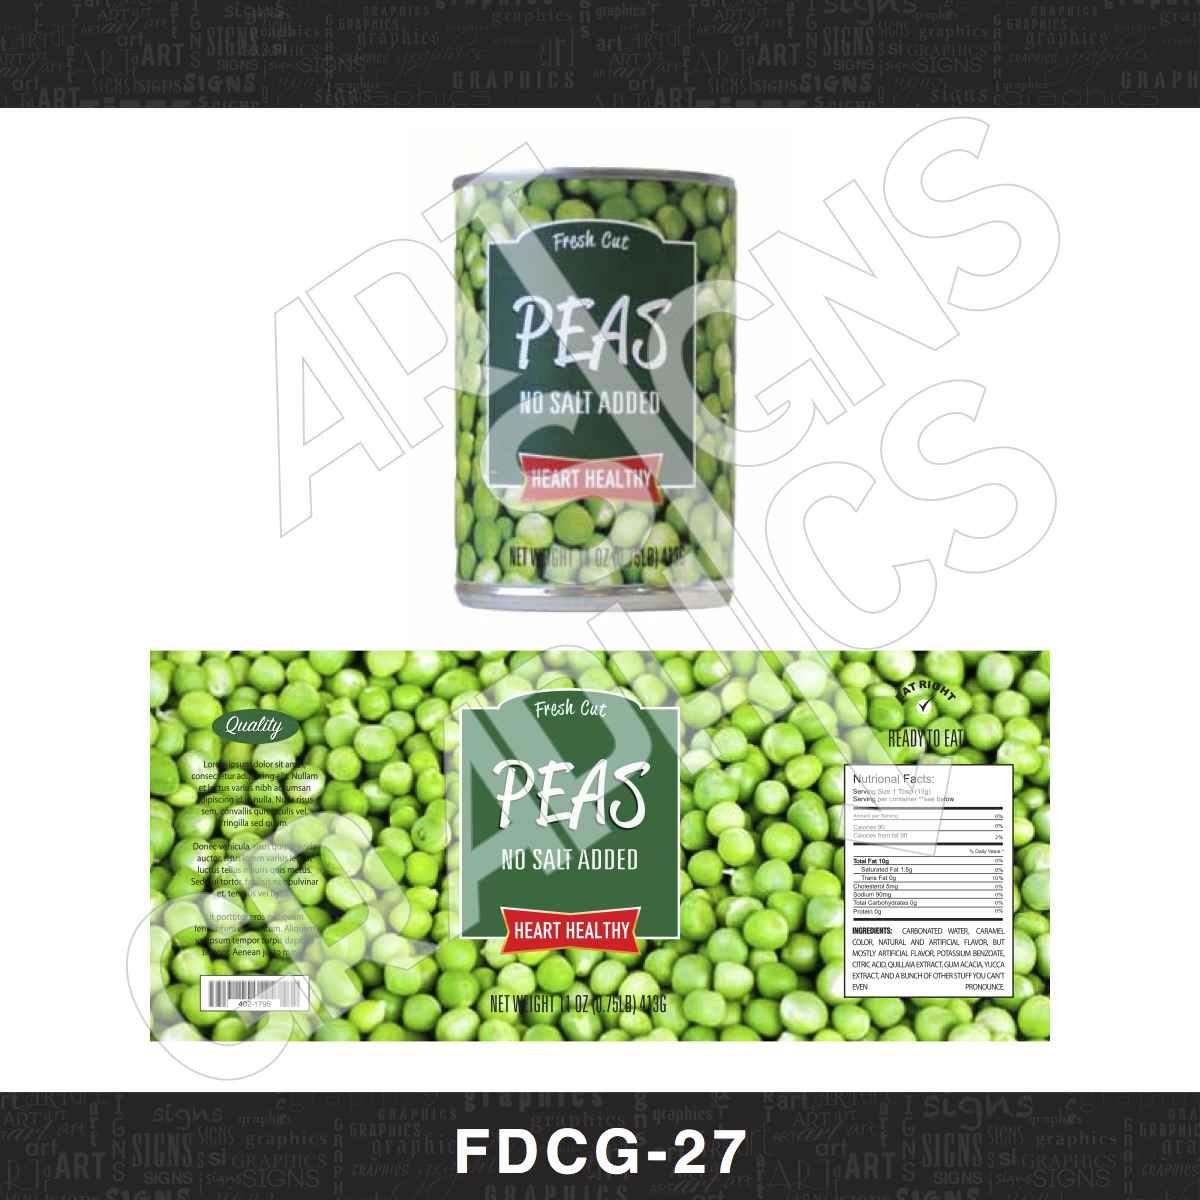 FDCG_27.jpg